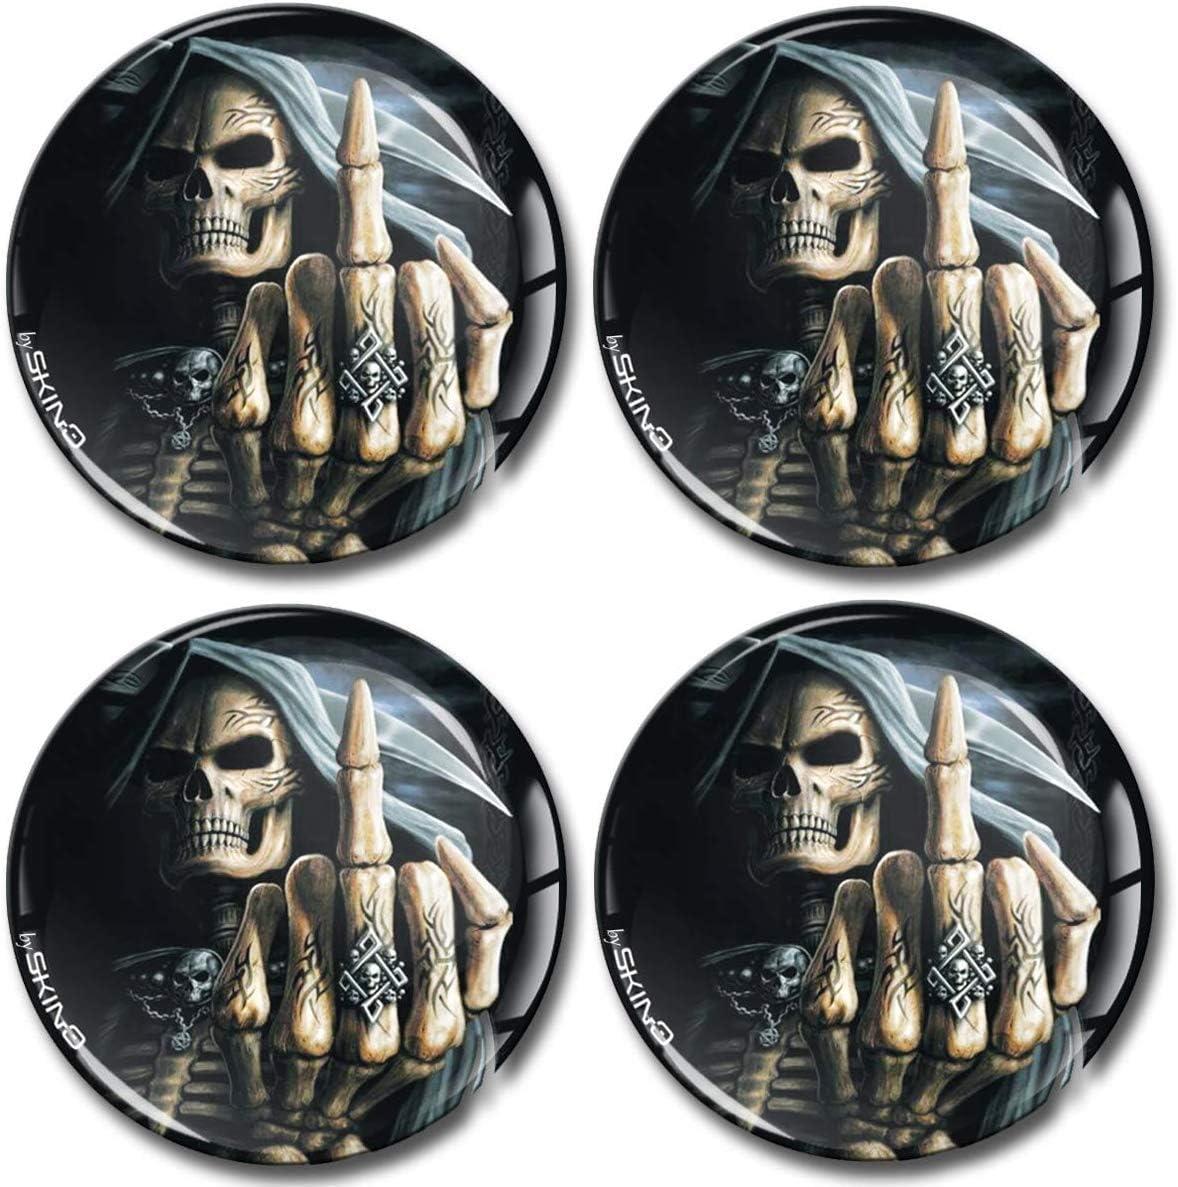 SkinoEu/® 4 x 60mm Aufkleber 3D Gel Silikon Autoaufkleber Stickers Totenkopf Sch/ädel Skull Skelett Felgenaufkleber F/ür Radkappen Nabenkappen Radnabendeckel Rad-Aufkleber Nabendeckel Auto Tuning A 2560